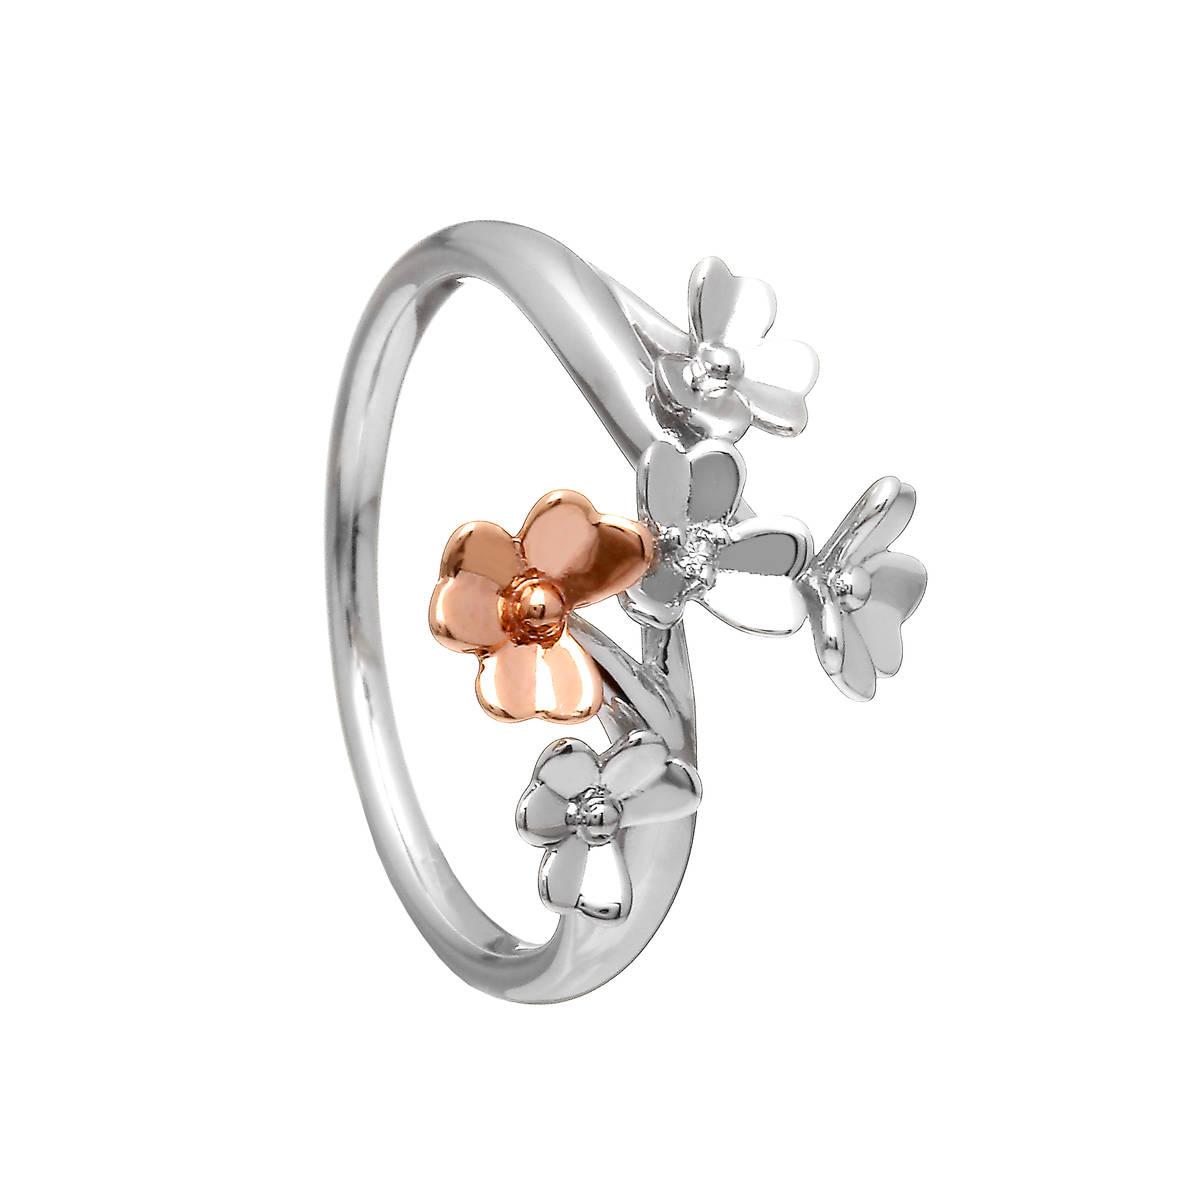 Diamond set 9 carat white gold love shamrock spray ring with one rare Irish rose gold flower. An elegant floral ring distinctly recognisable as Irish.